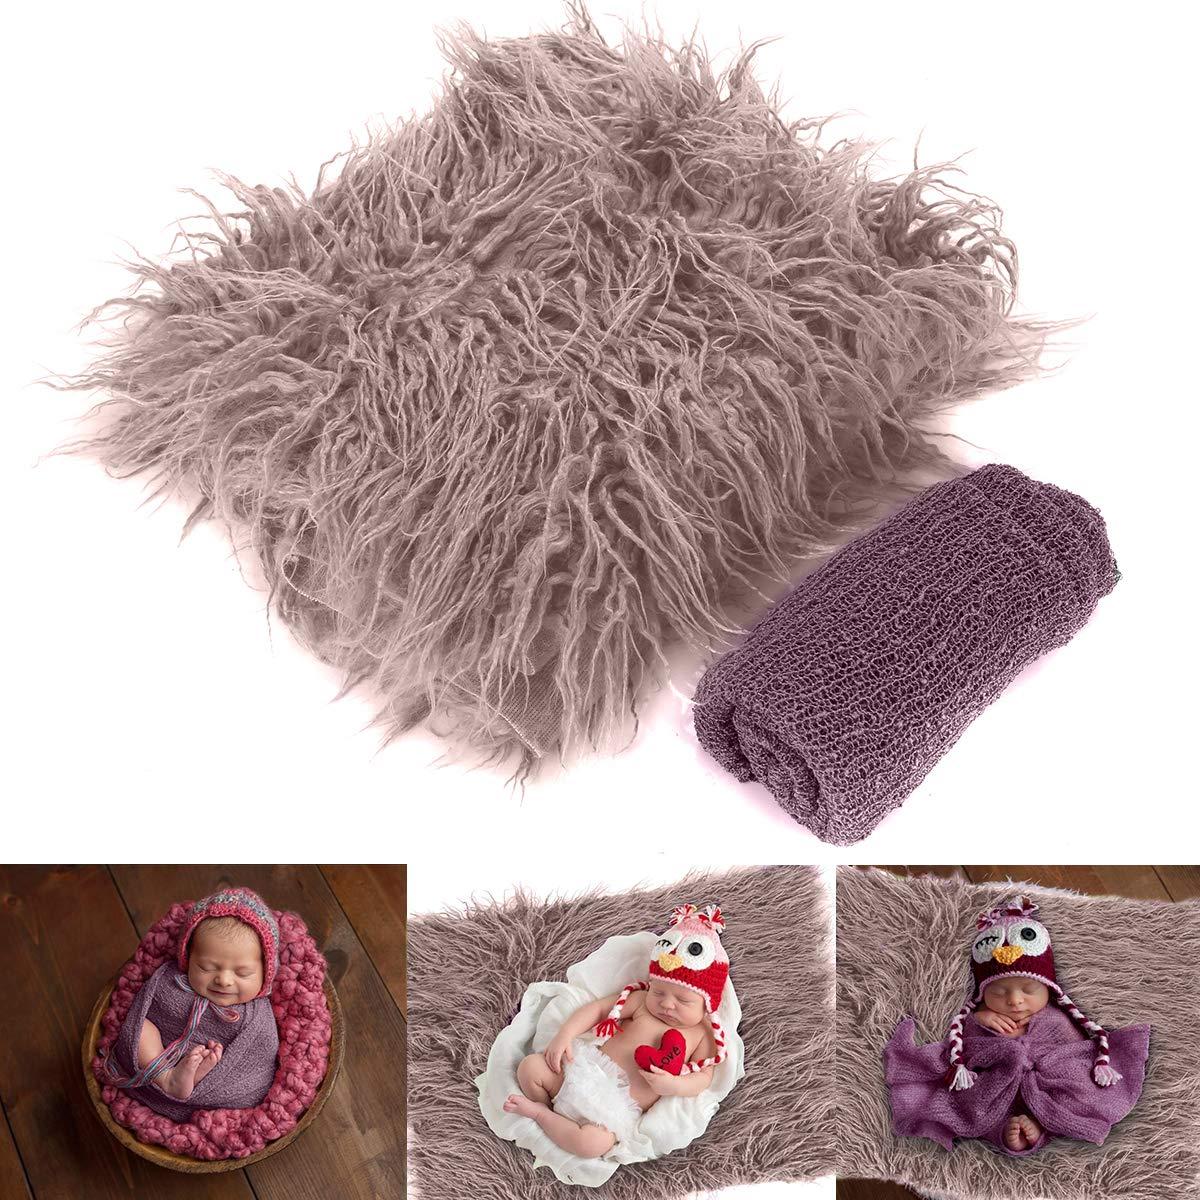 2PCS Newborn Baby Photo Props Fluffy Blanket + Ripple Wrap Set, DIY Newborn Photography Wrap Mat for Baby Boys and Girls